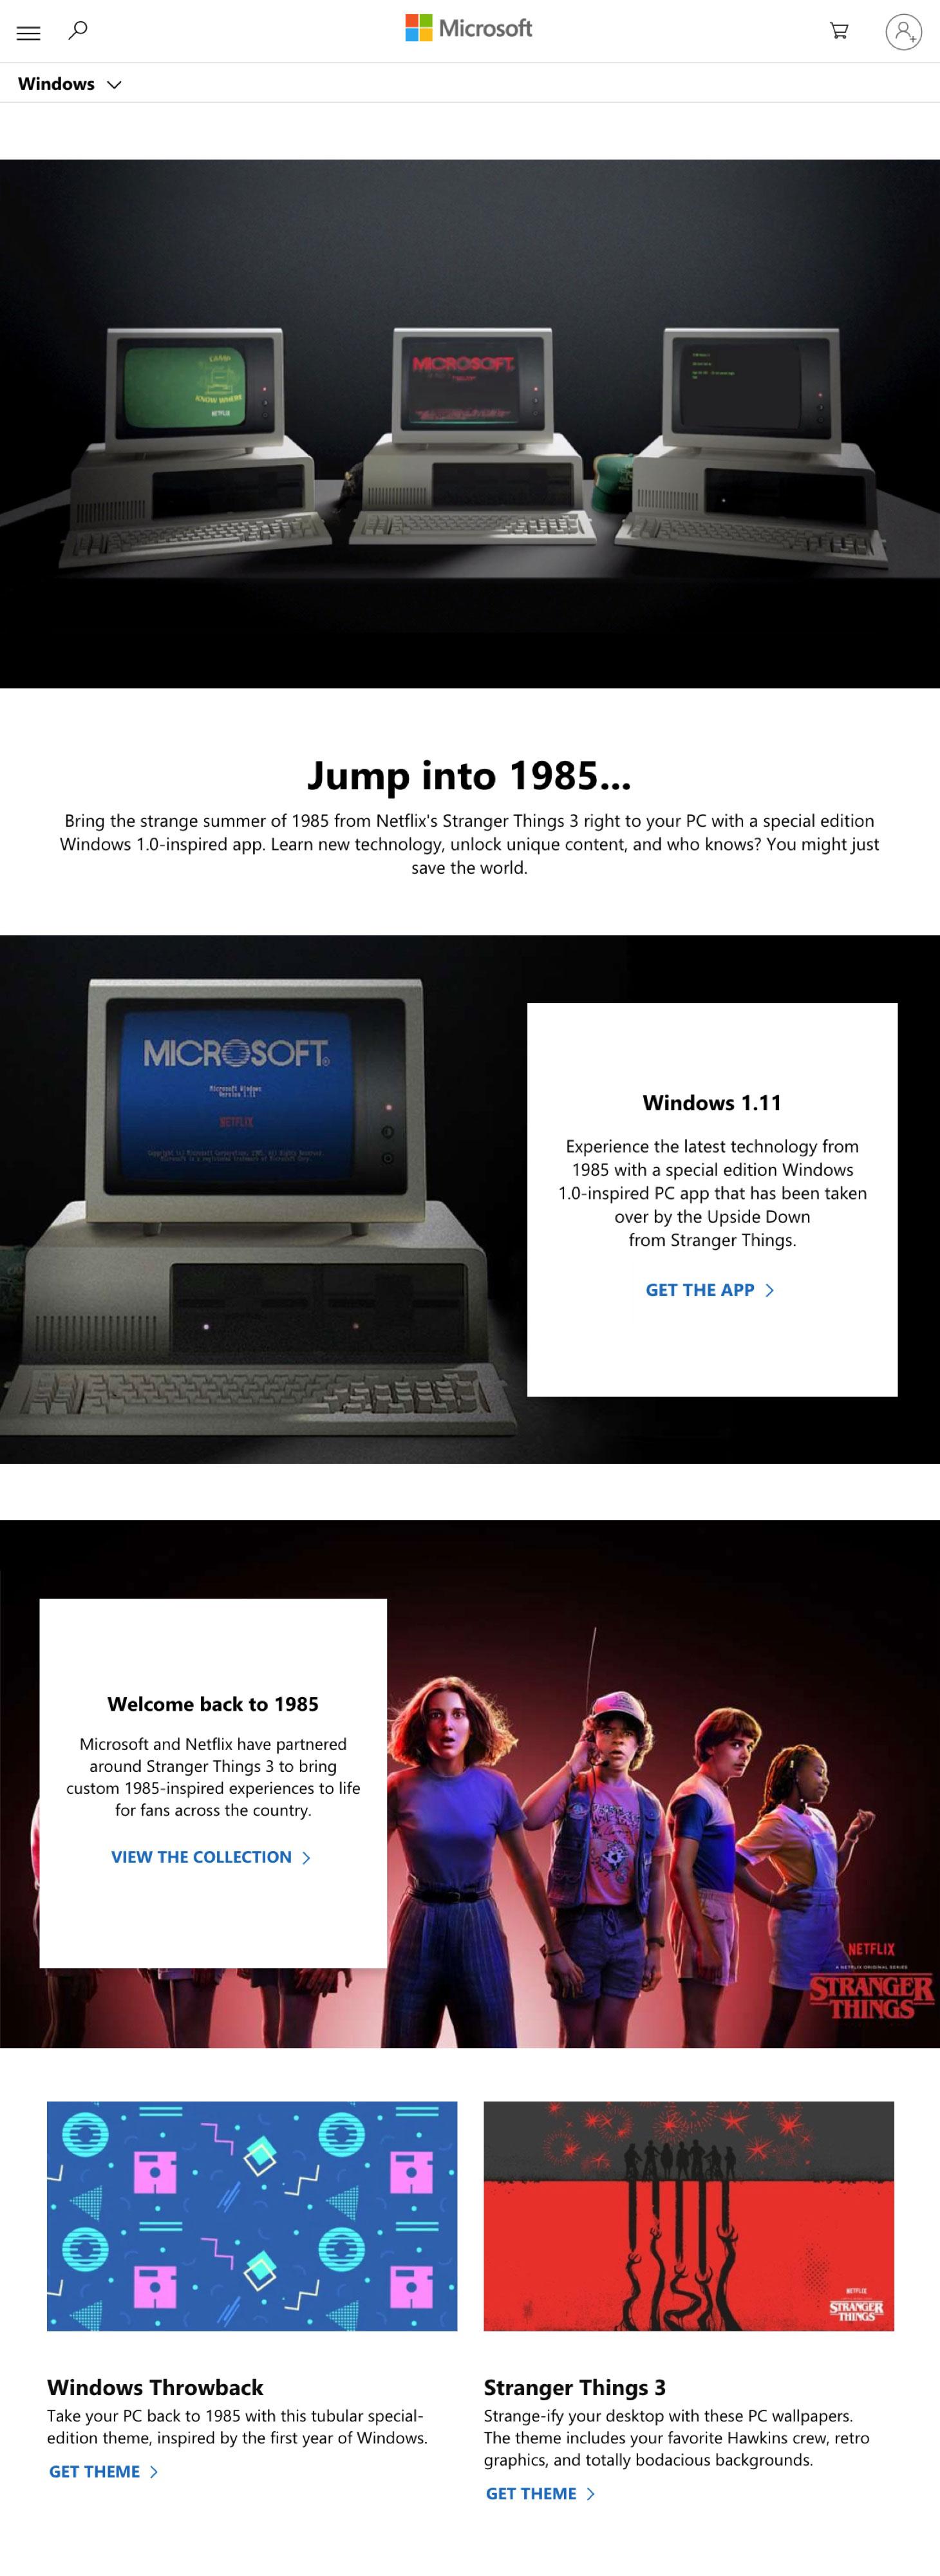 Microsoft_ST_landing_page@2x